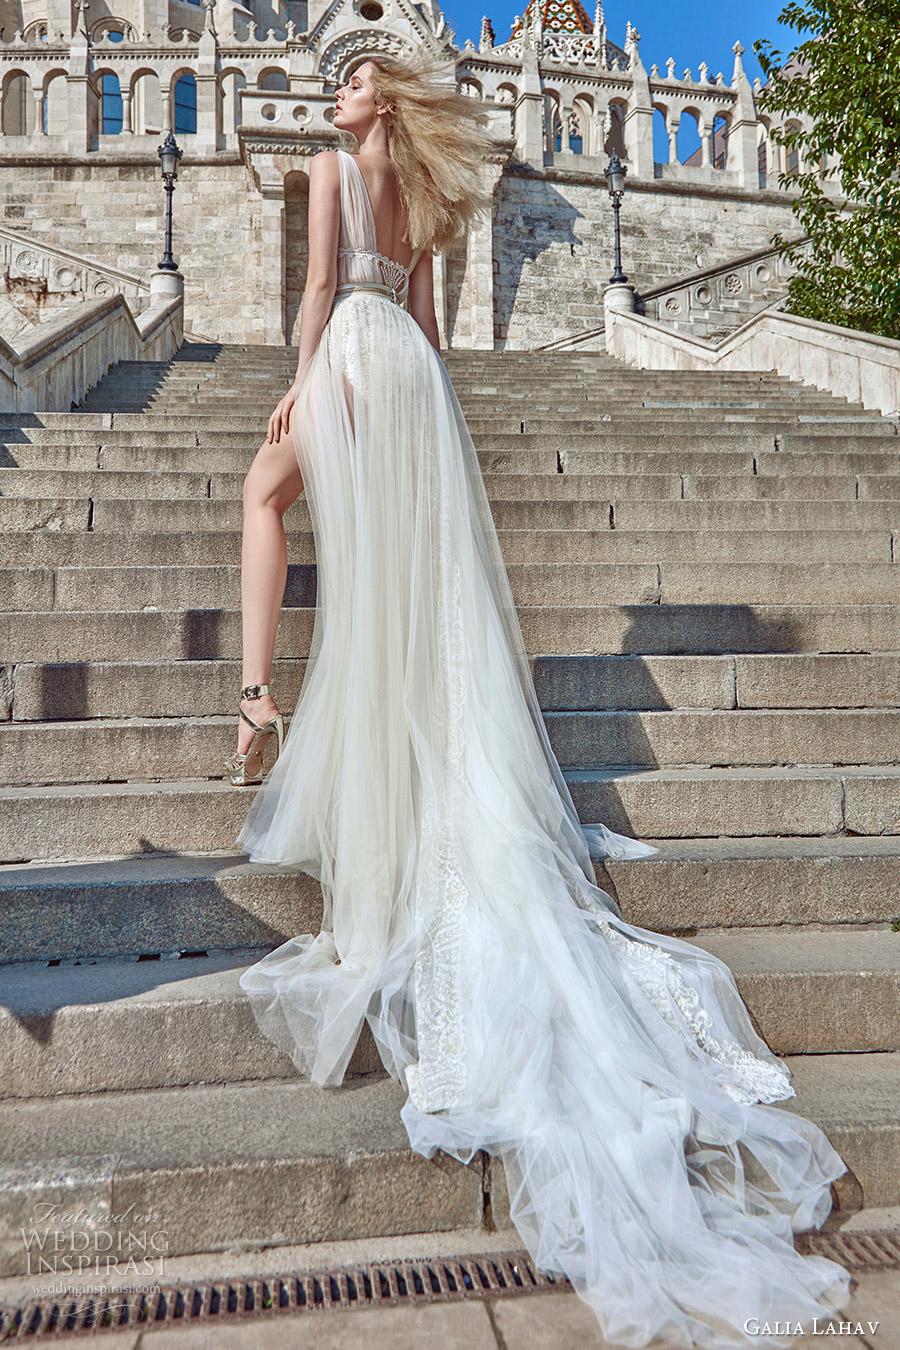 galia lahav fall 2016 bridal sleeveless illusion jewel neck draped straps illusion bodice a line overskirt wedding dress (flavia) grecian edgy bv